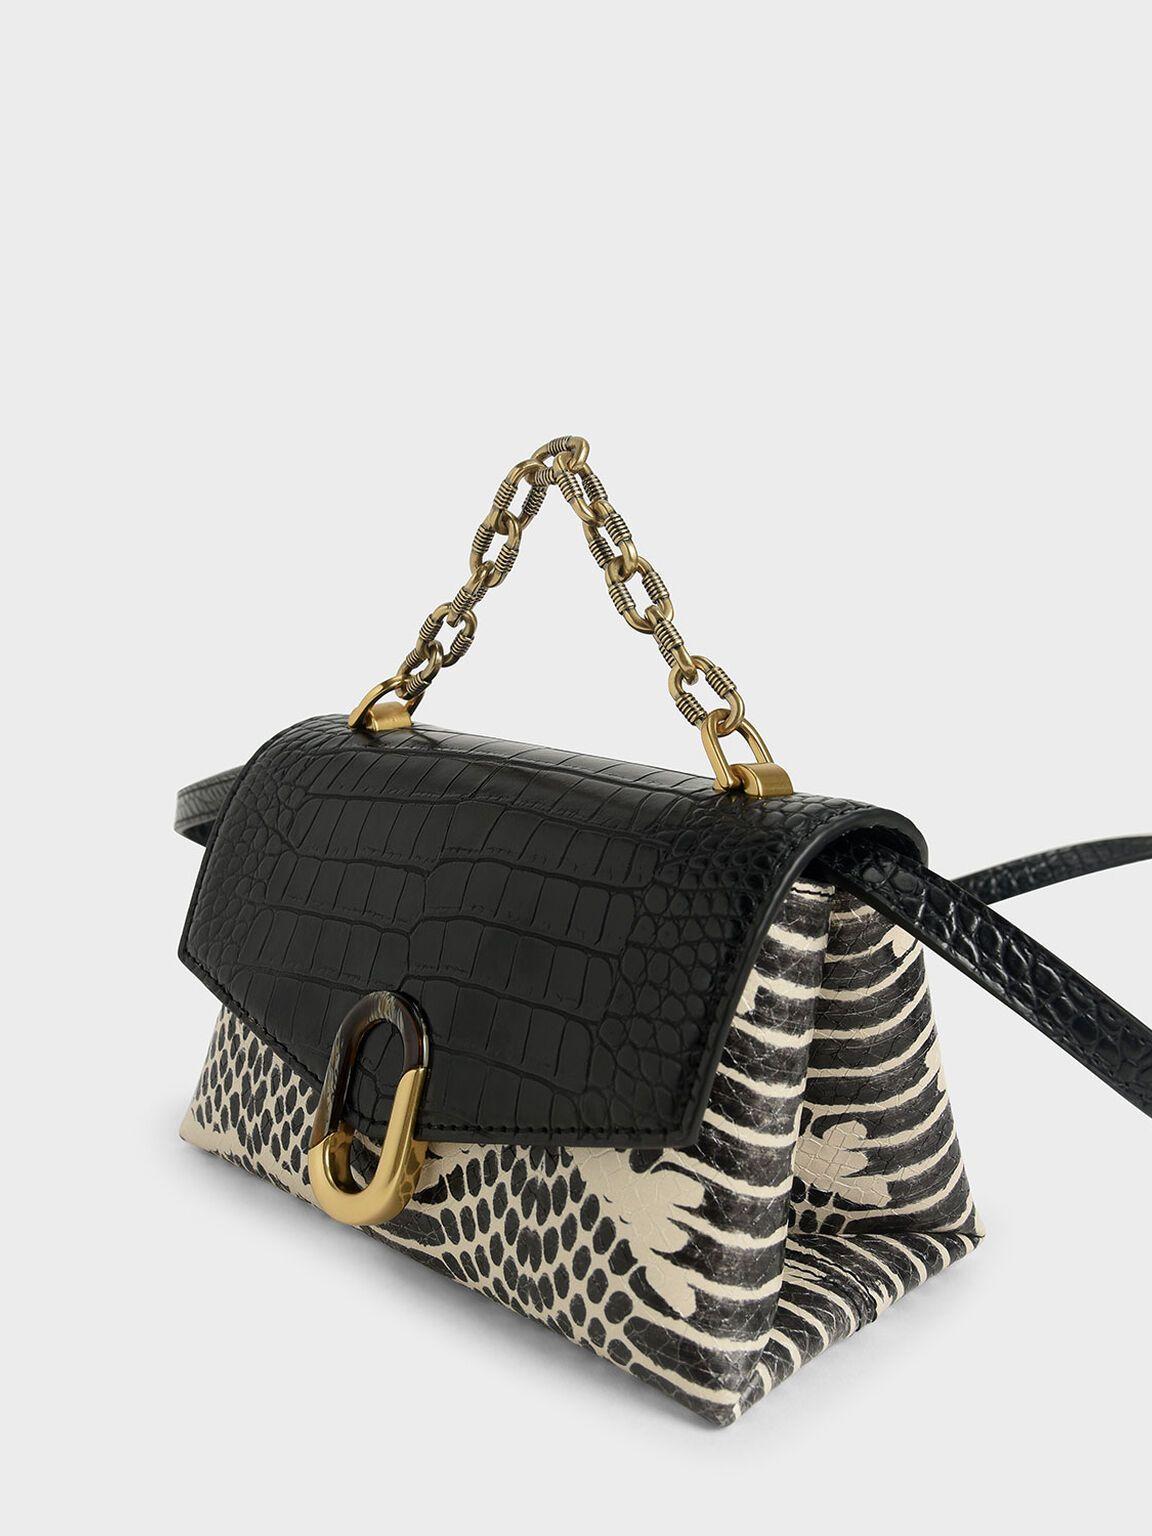 WOMENS LADIES DESIGNER CROC EFFECT CHAIN FAUX LEATHER CLUTCH BAG TOP HANDLE BAG